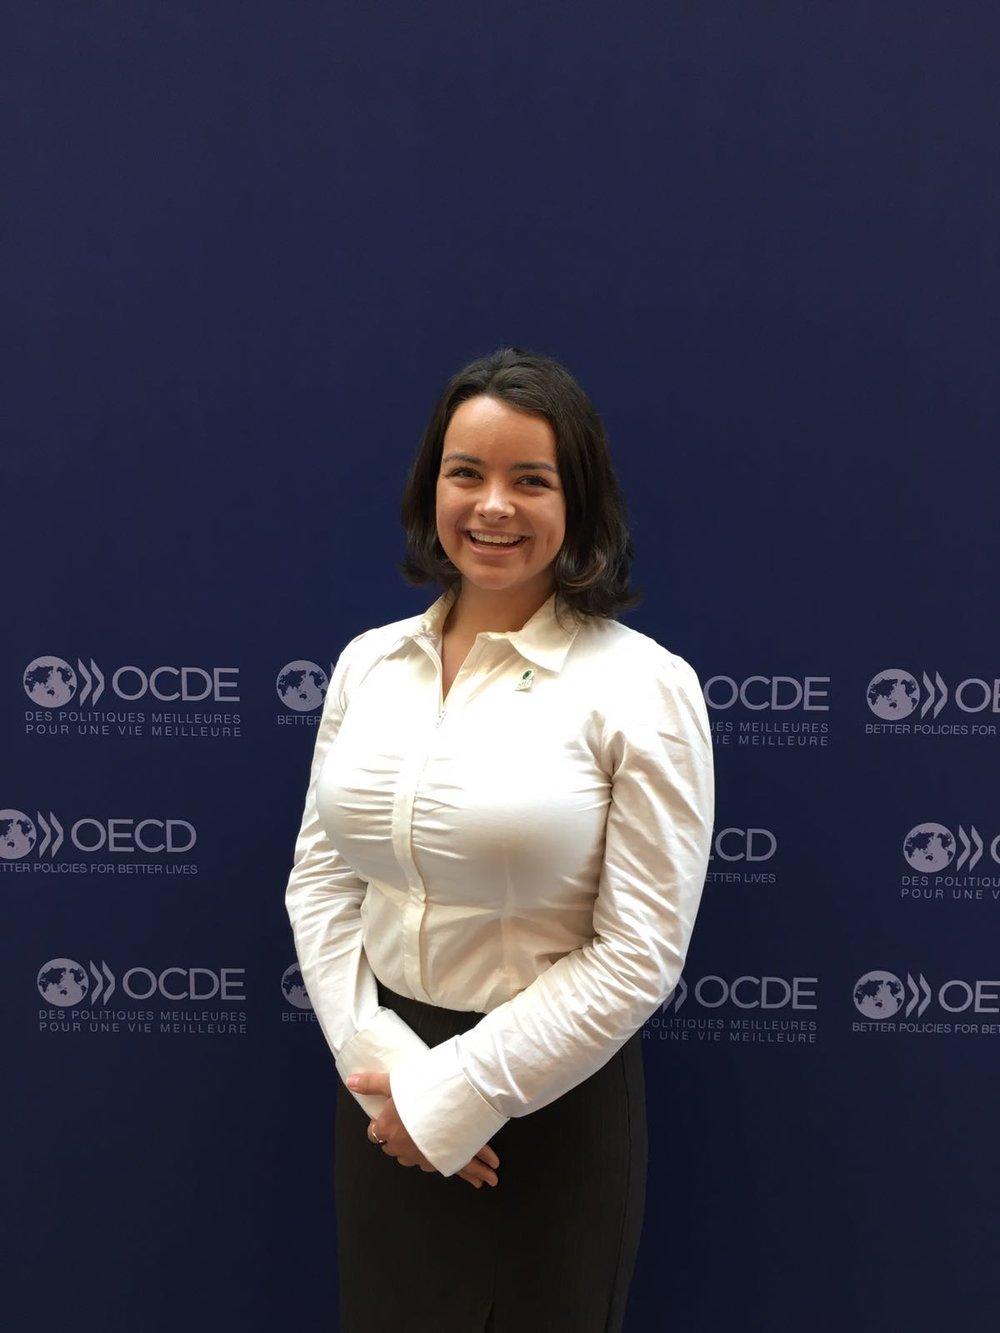 Zoe Neill OECD Headshot No. 2 copy.jpeg